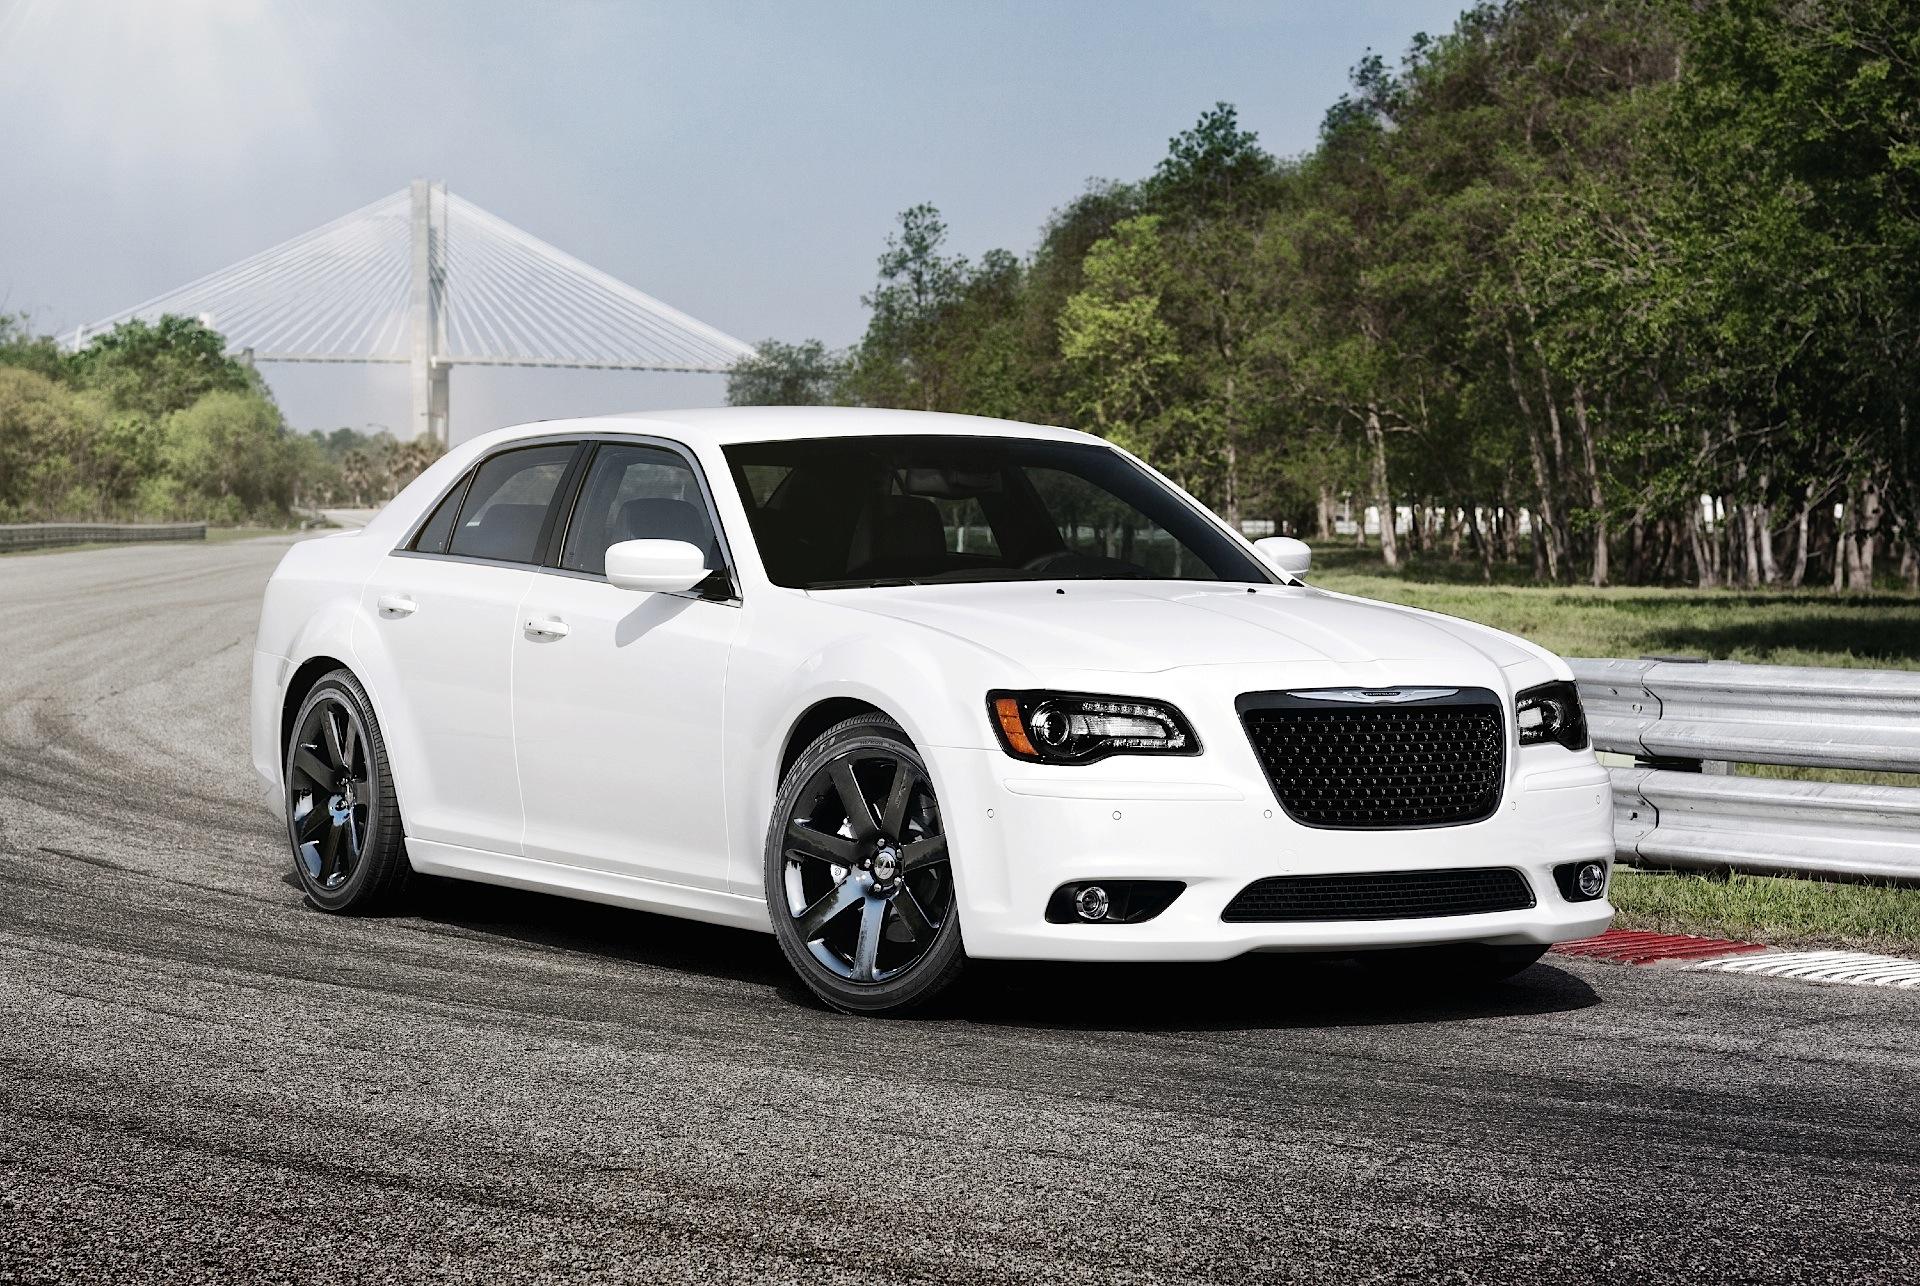 curso decoracao de interiores belo horizonte : curso decoracao de interiores belo horizonte:2012 Chrysler 300 SRT8